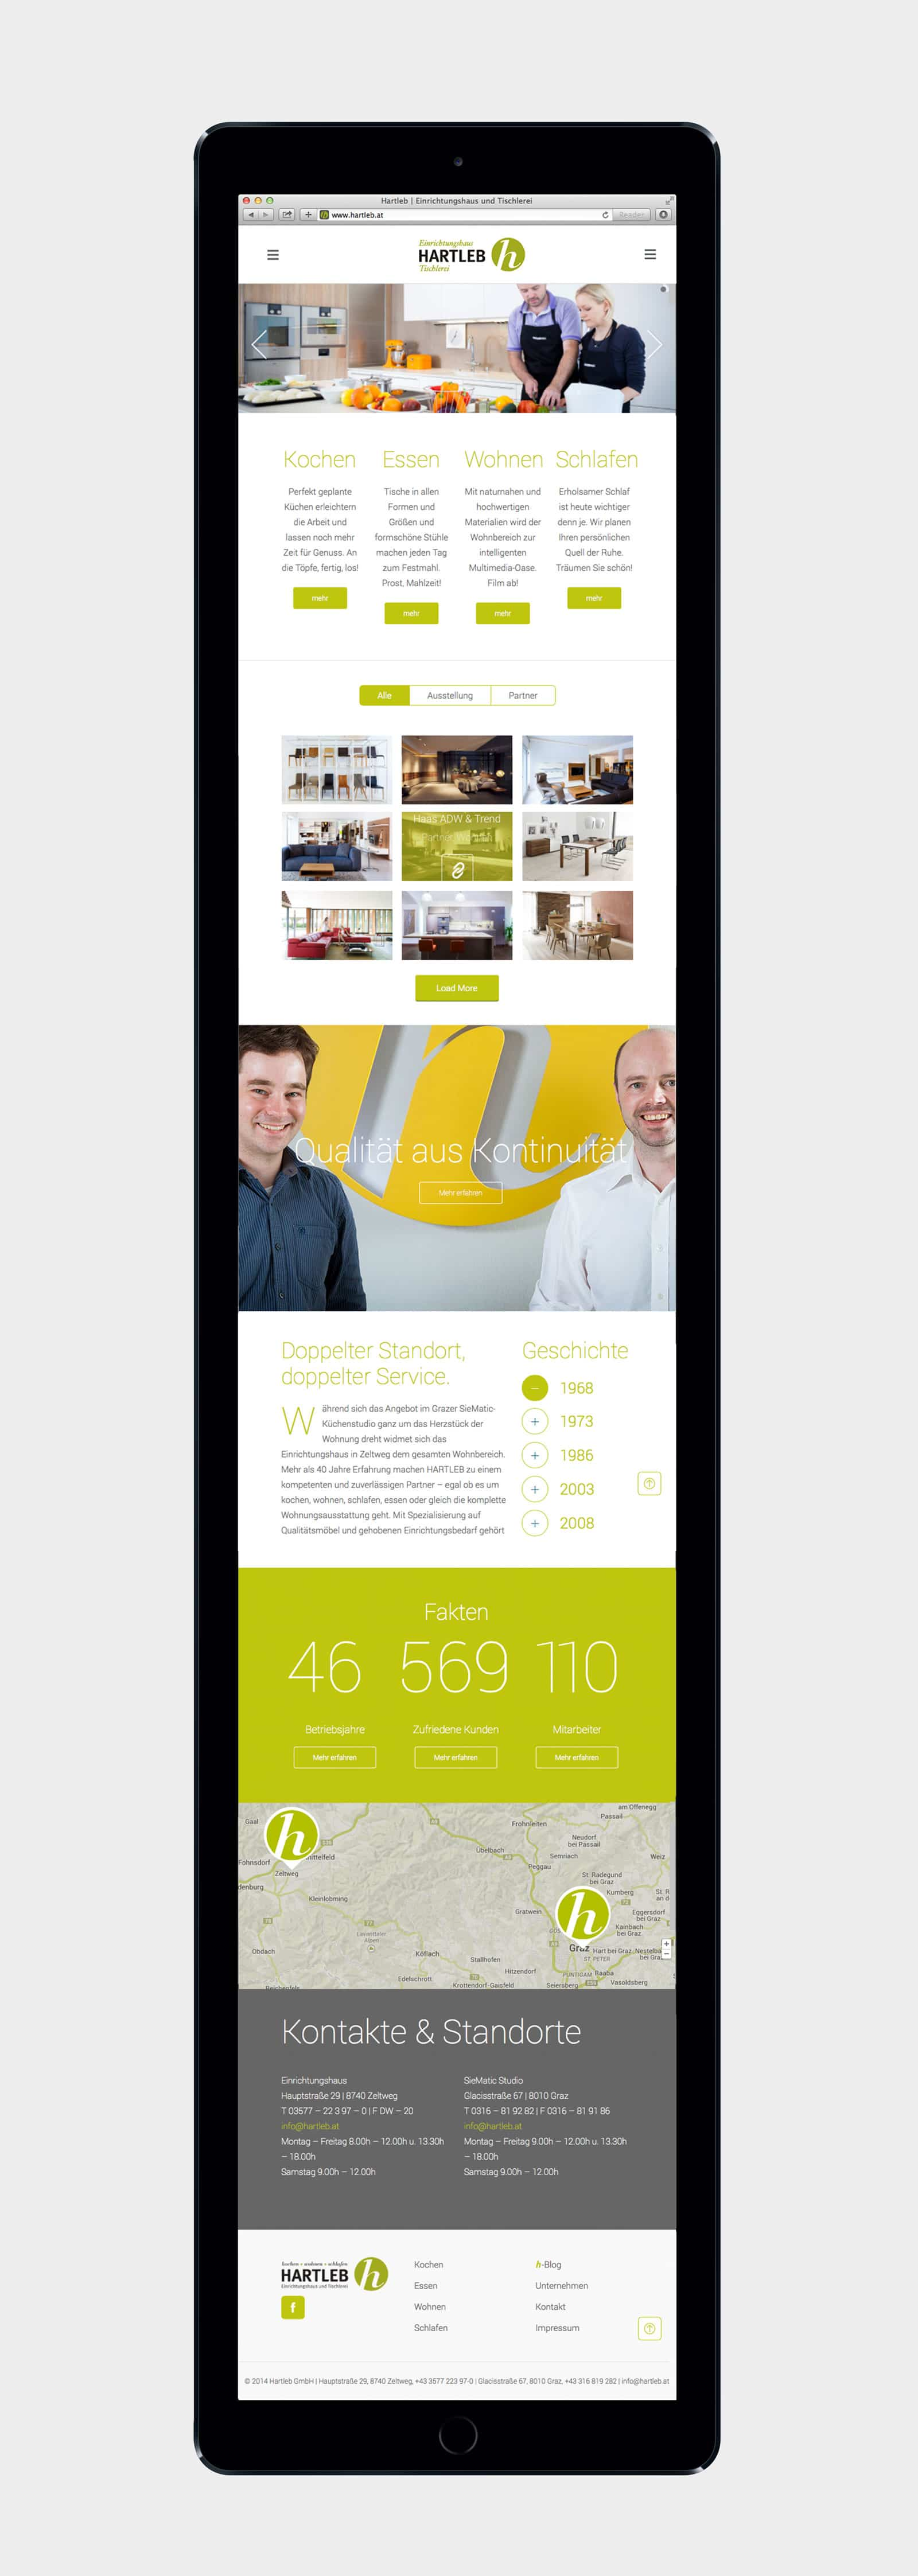 hartleb-website-design_screen02